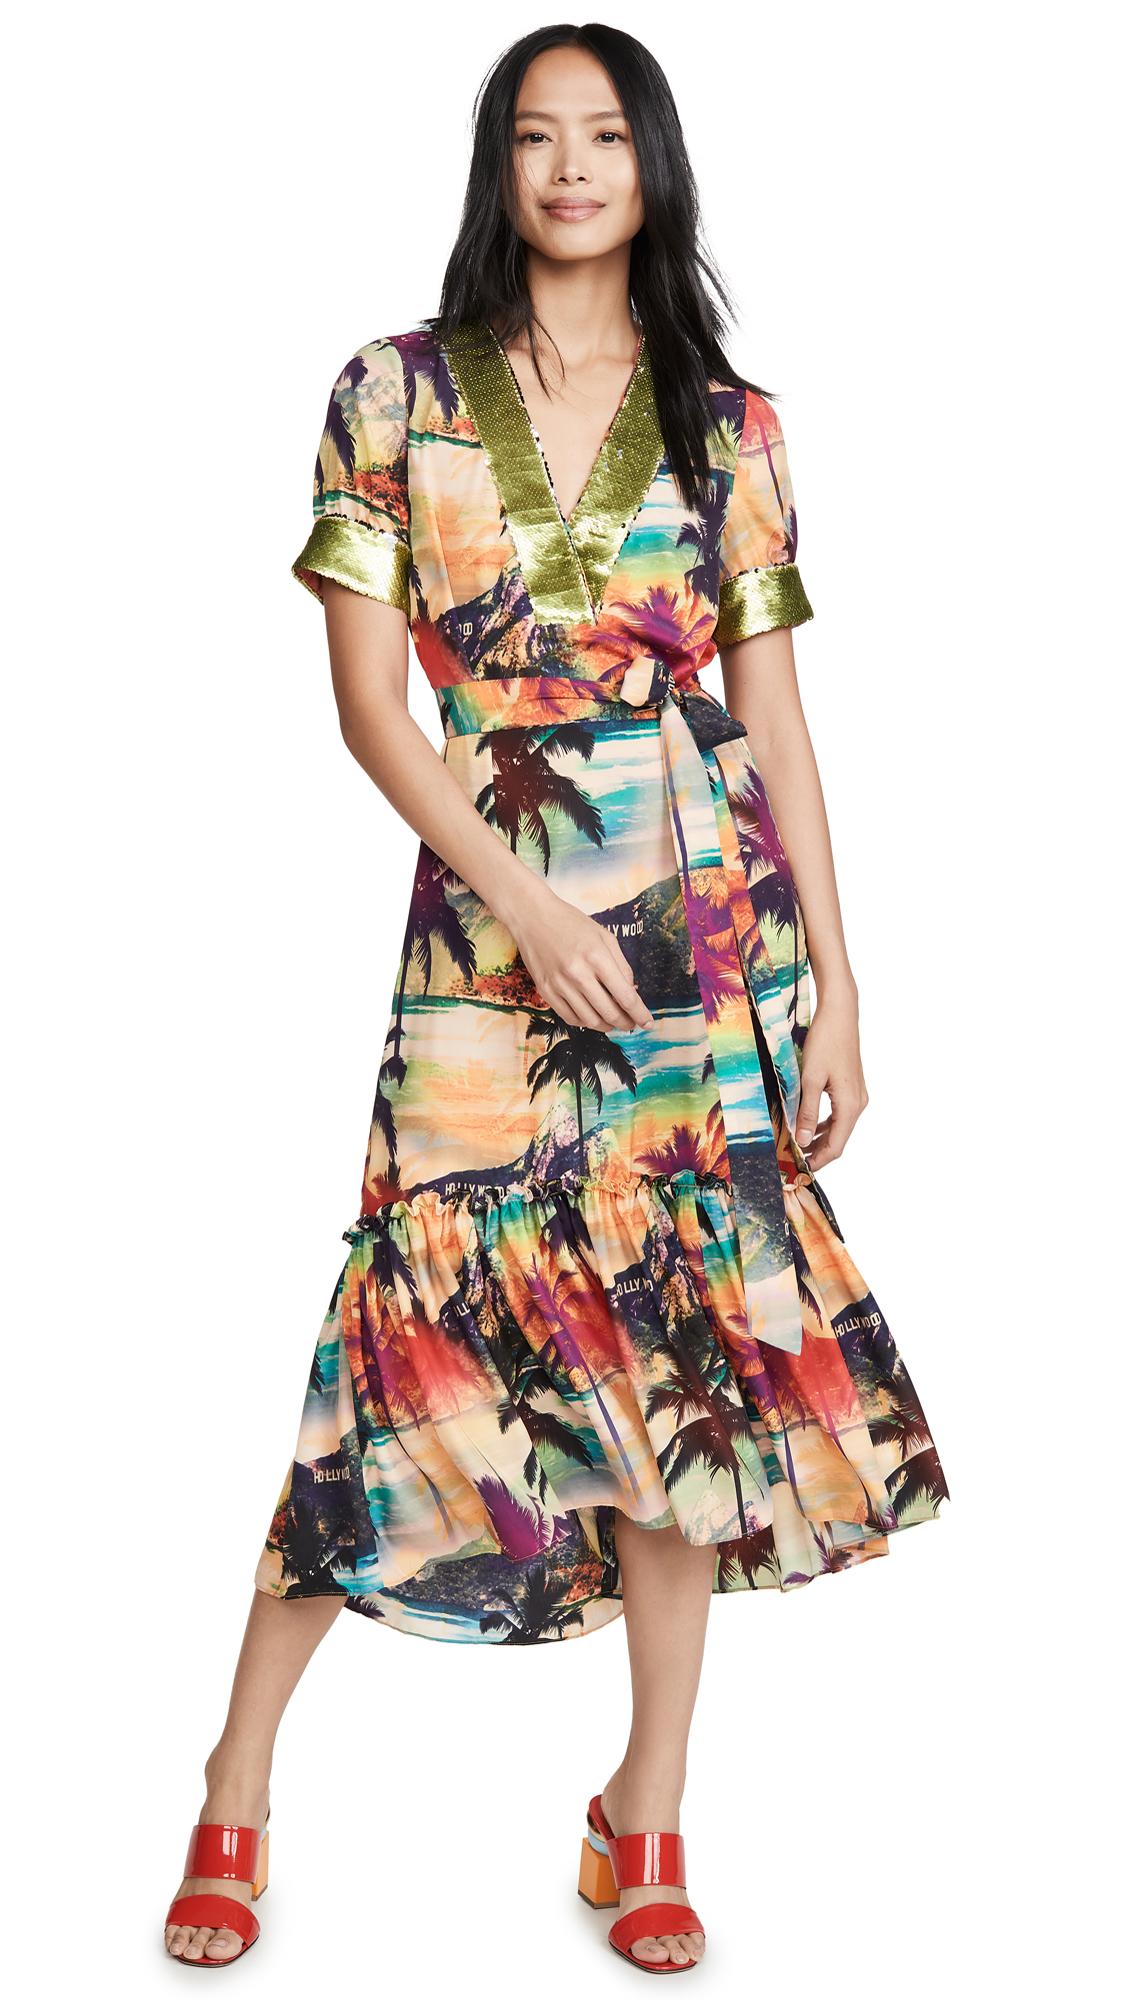 Le Superbe Beachwood Canyon Dress - 50% Off Sale